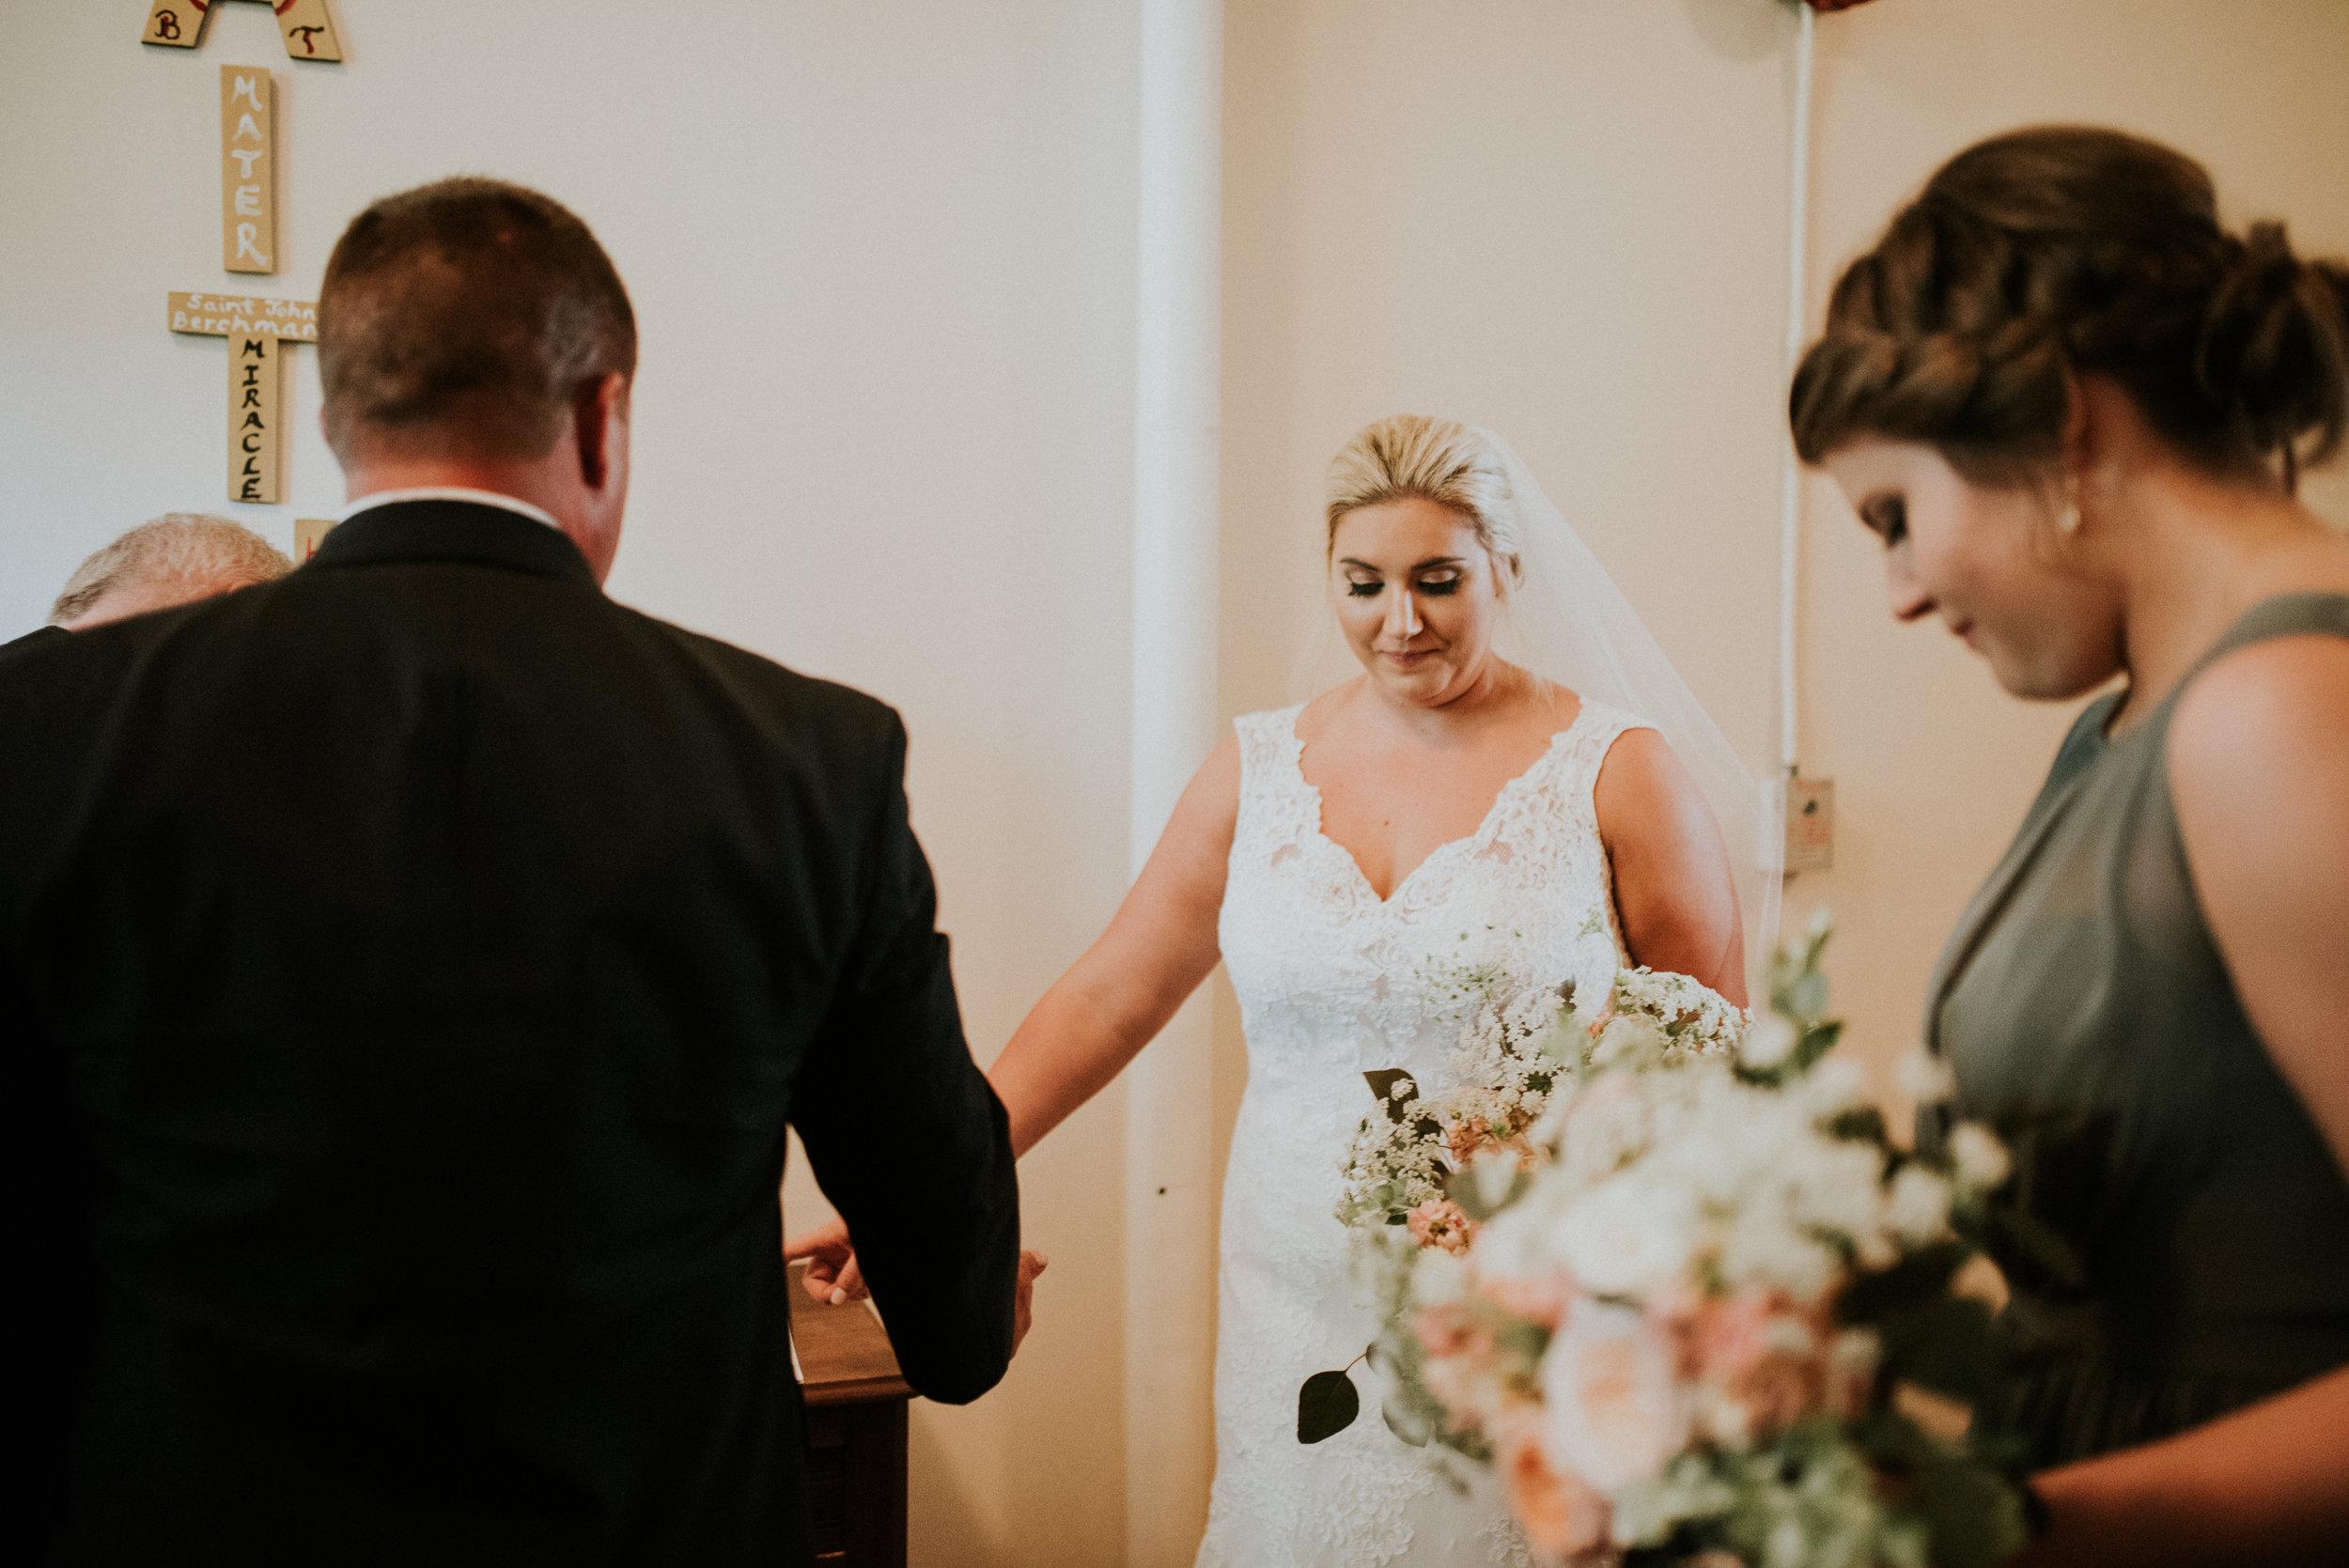 Southern Fete, Southern Wedding, Praying, Hannah Mulligan Photography, Bride